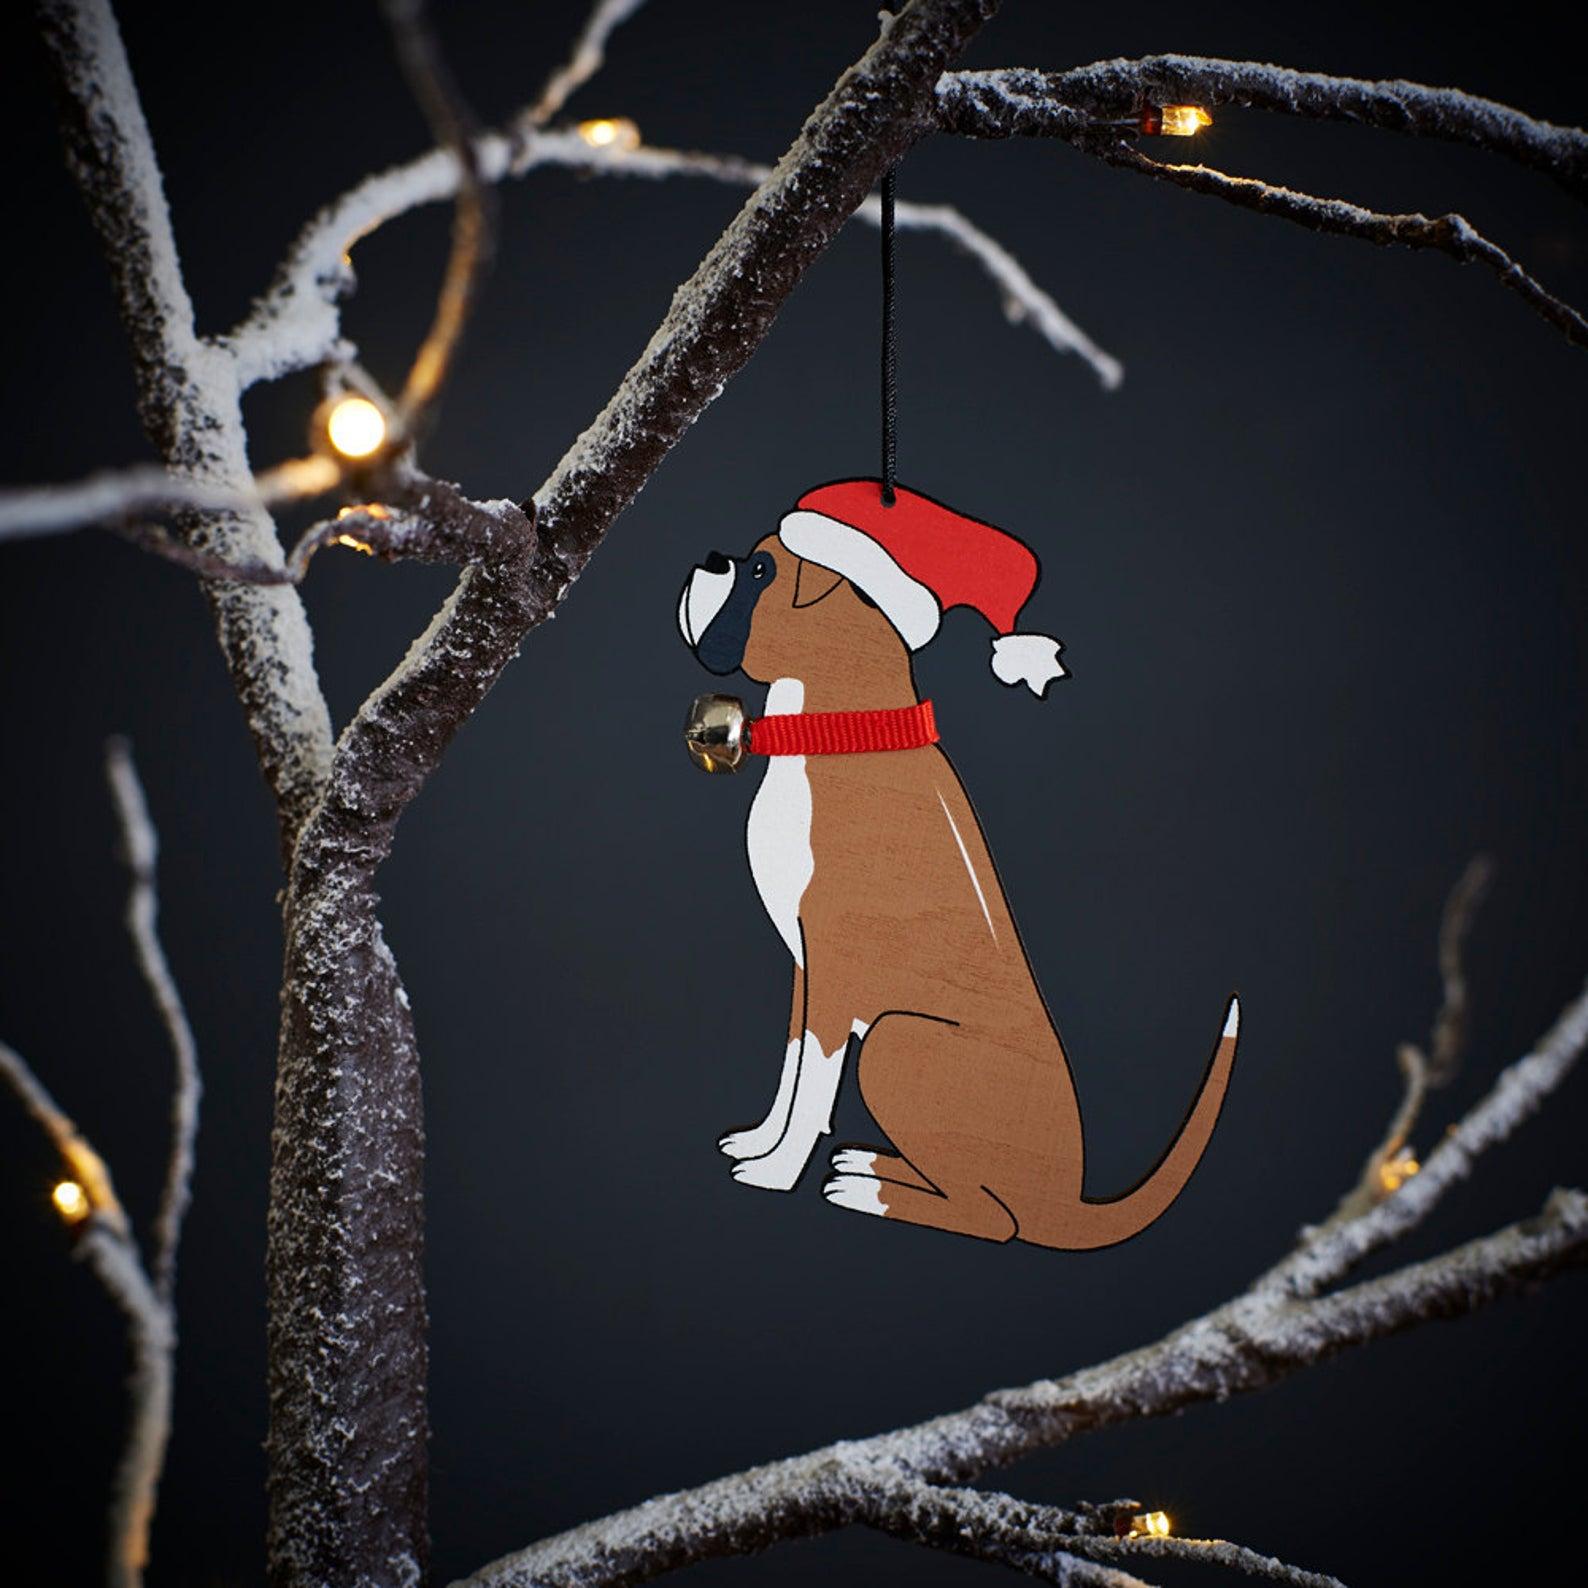 Boxer Dog Christmas Ornament via SweetWilliamLondon on Etsy